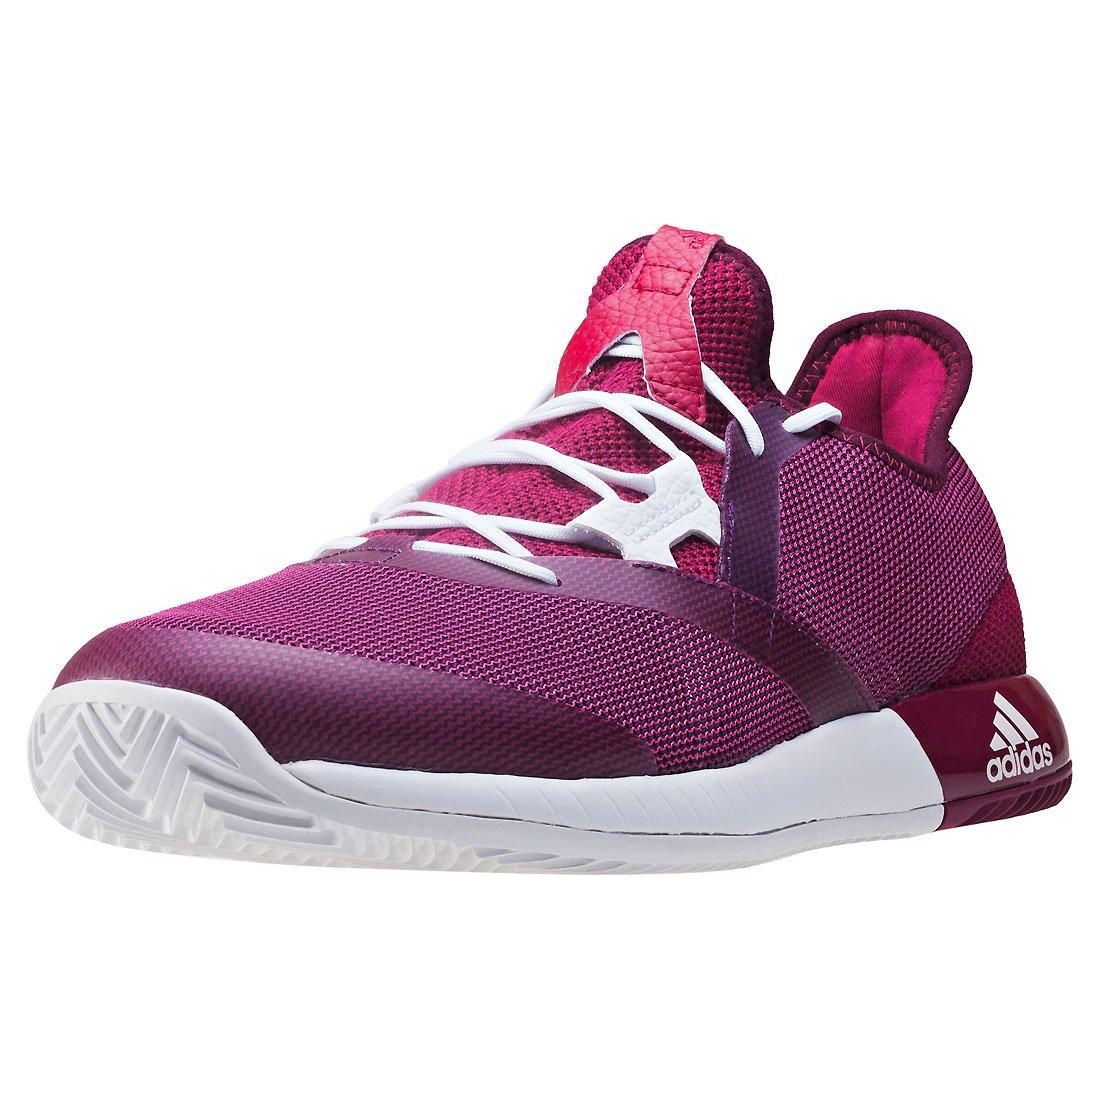 MultiCouleure (Rubmis   Ftwbla   Rojnoc) adidas Adizero Defiant Bounce W, Chaussures de Tennis Femme 38 2 3 EU